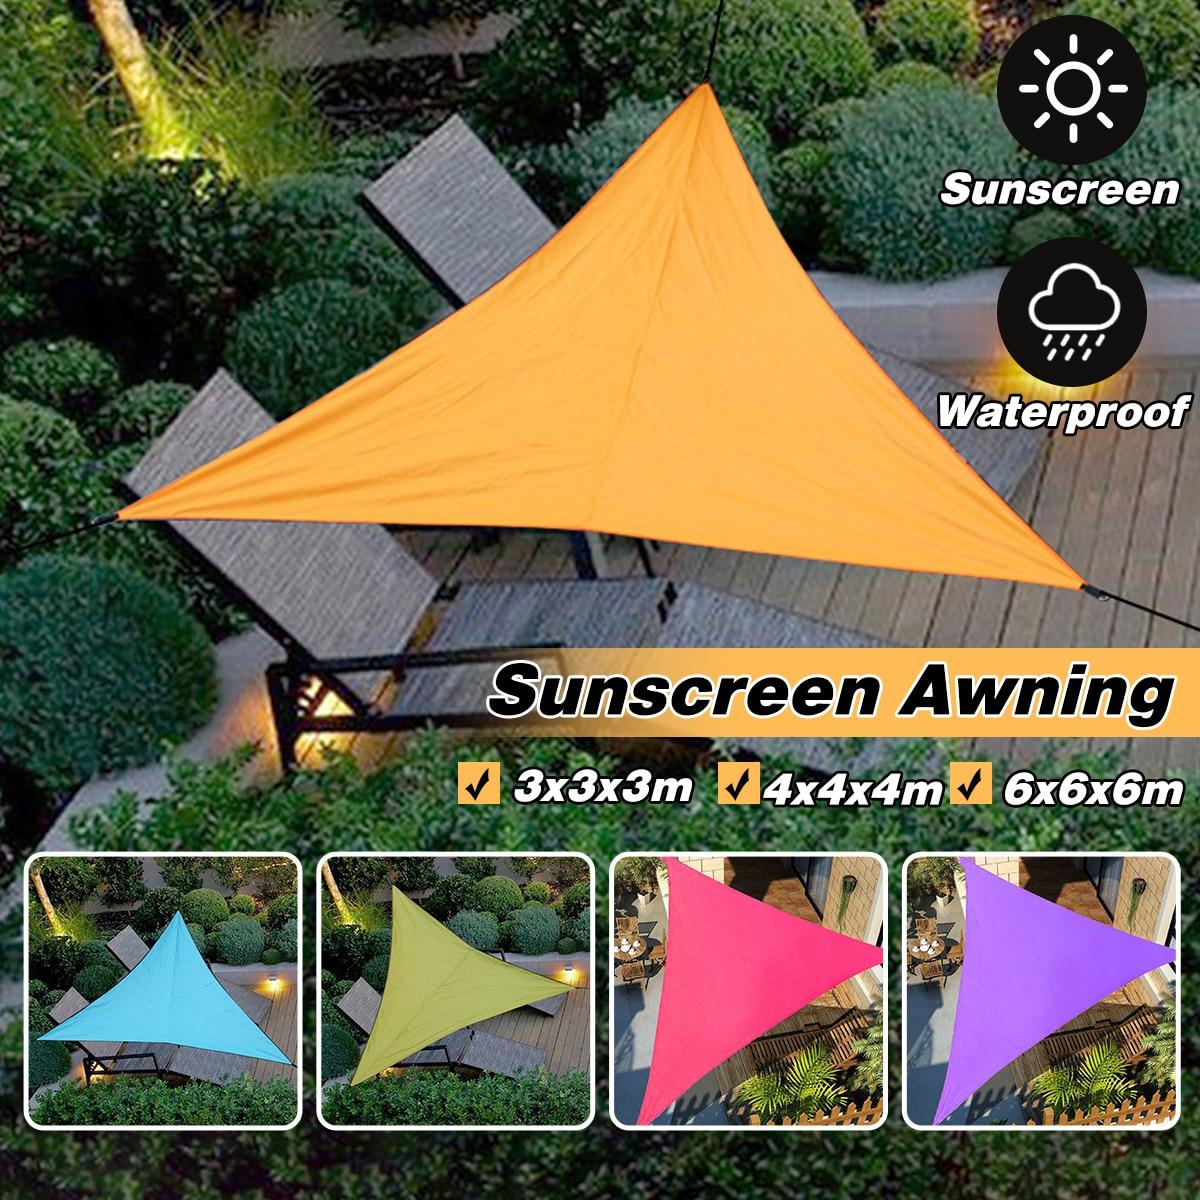 Summer Heavy Shade Sail Sun Canopy Cover Outdoor Trilateral Garden Yard Awnings Waterproof Car Sunshade Cloth